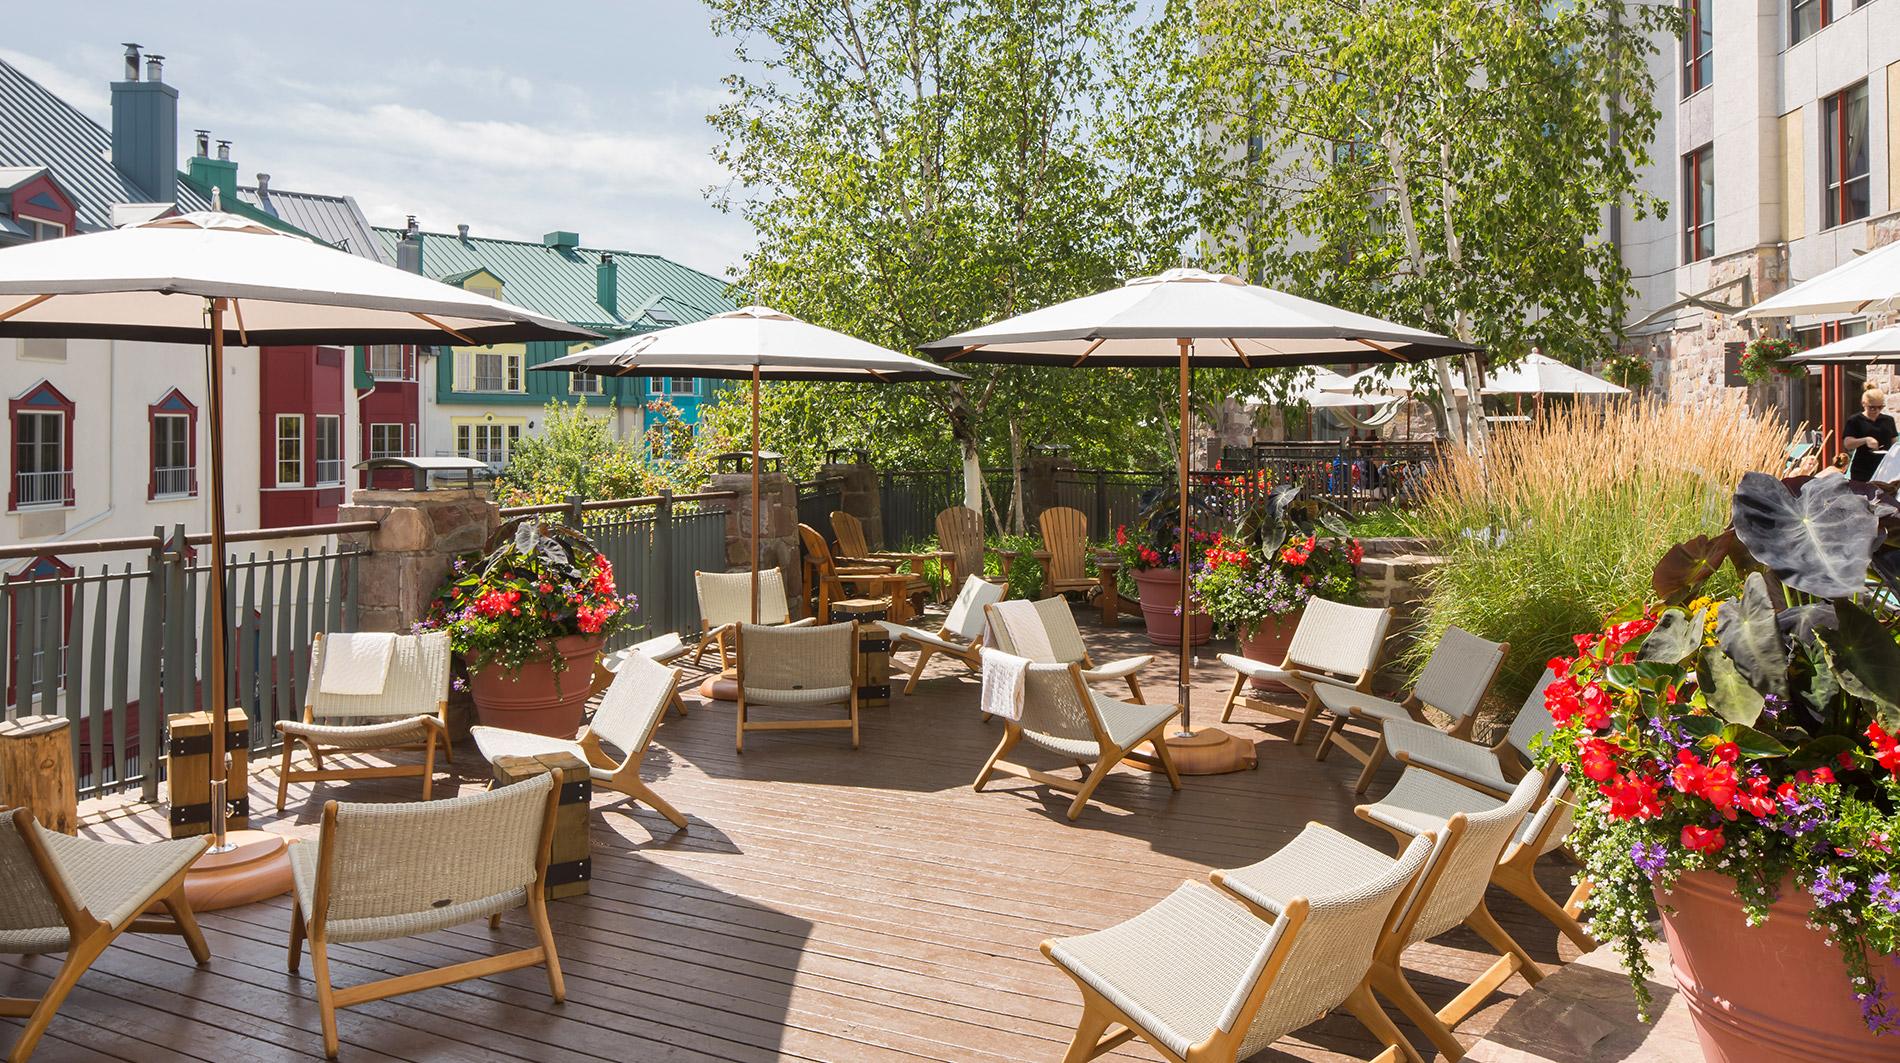 Fairmont-Tremblant-summer-pool-terrace.jpg